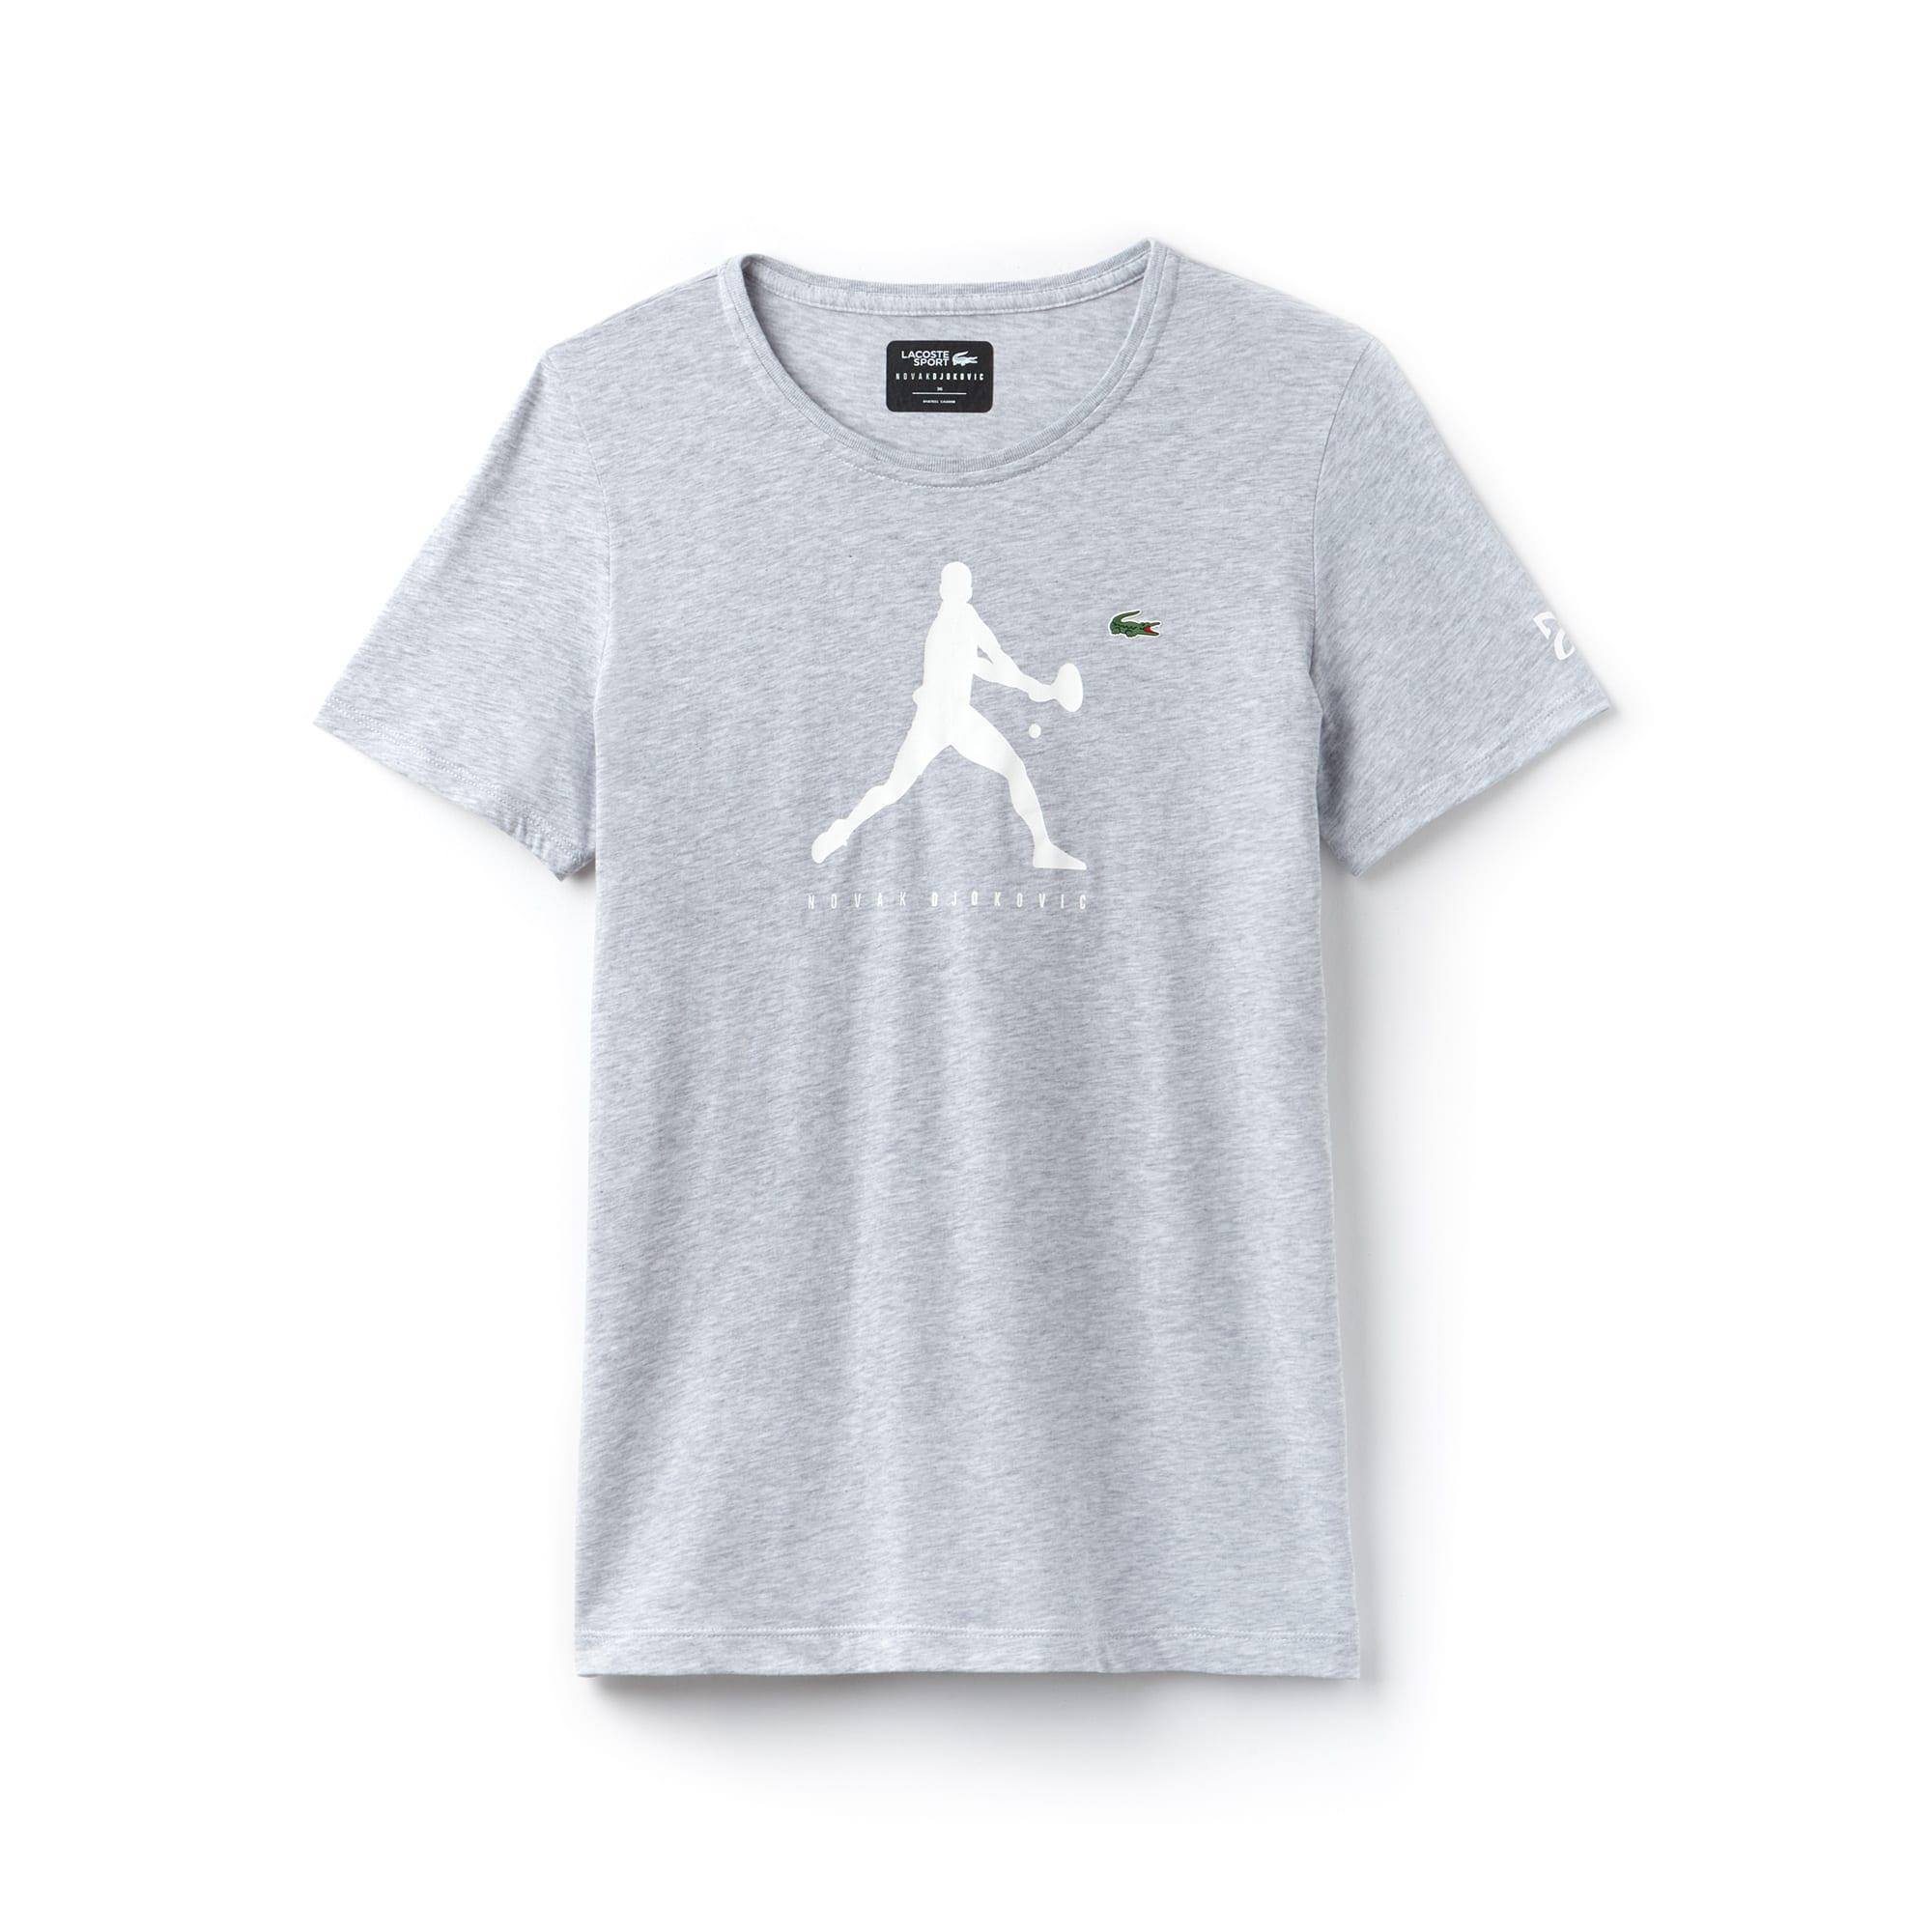 T-shirt girocollo Lacoste SPORT COLLEZIONE NOVAK DJOKOVIC SUPPORT WITH STYLE in jersey tinta unita con stampa